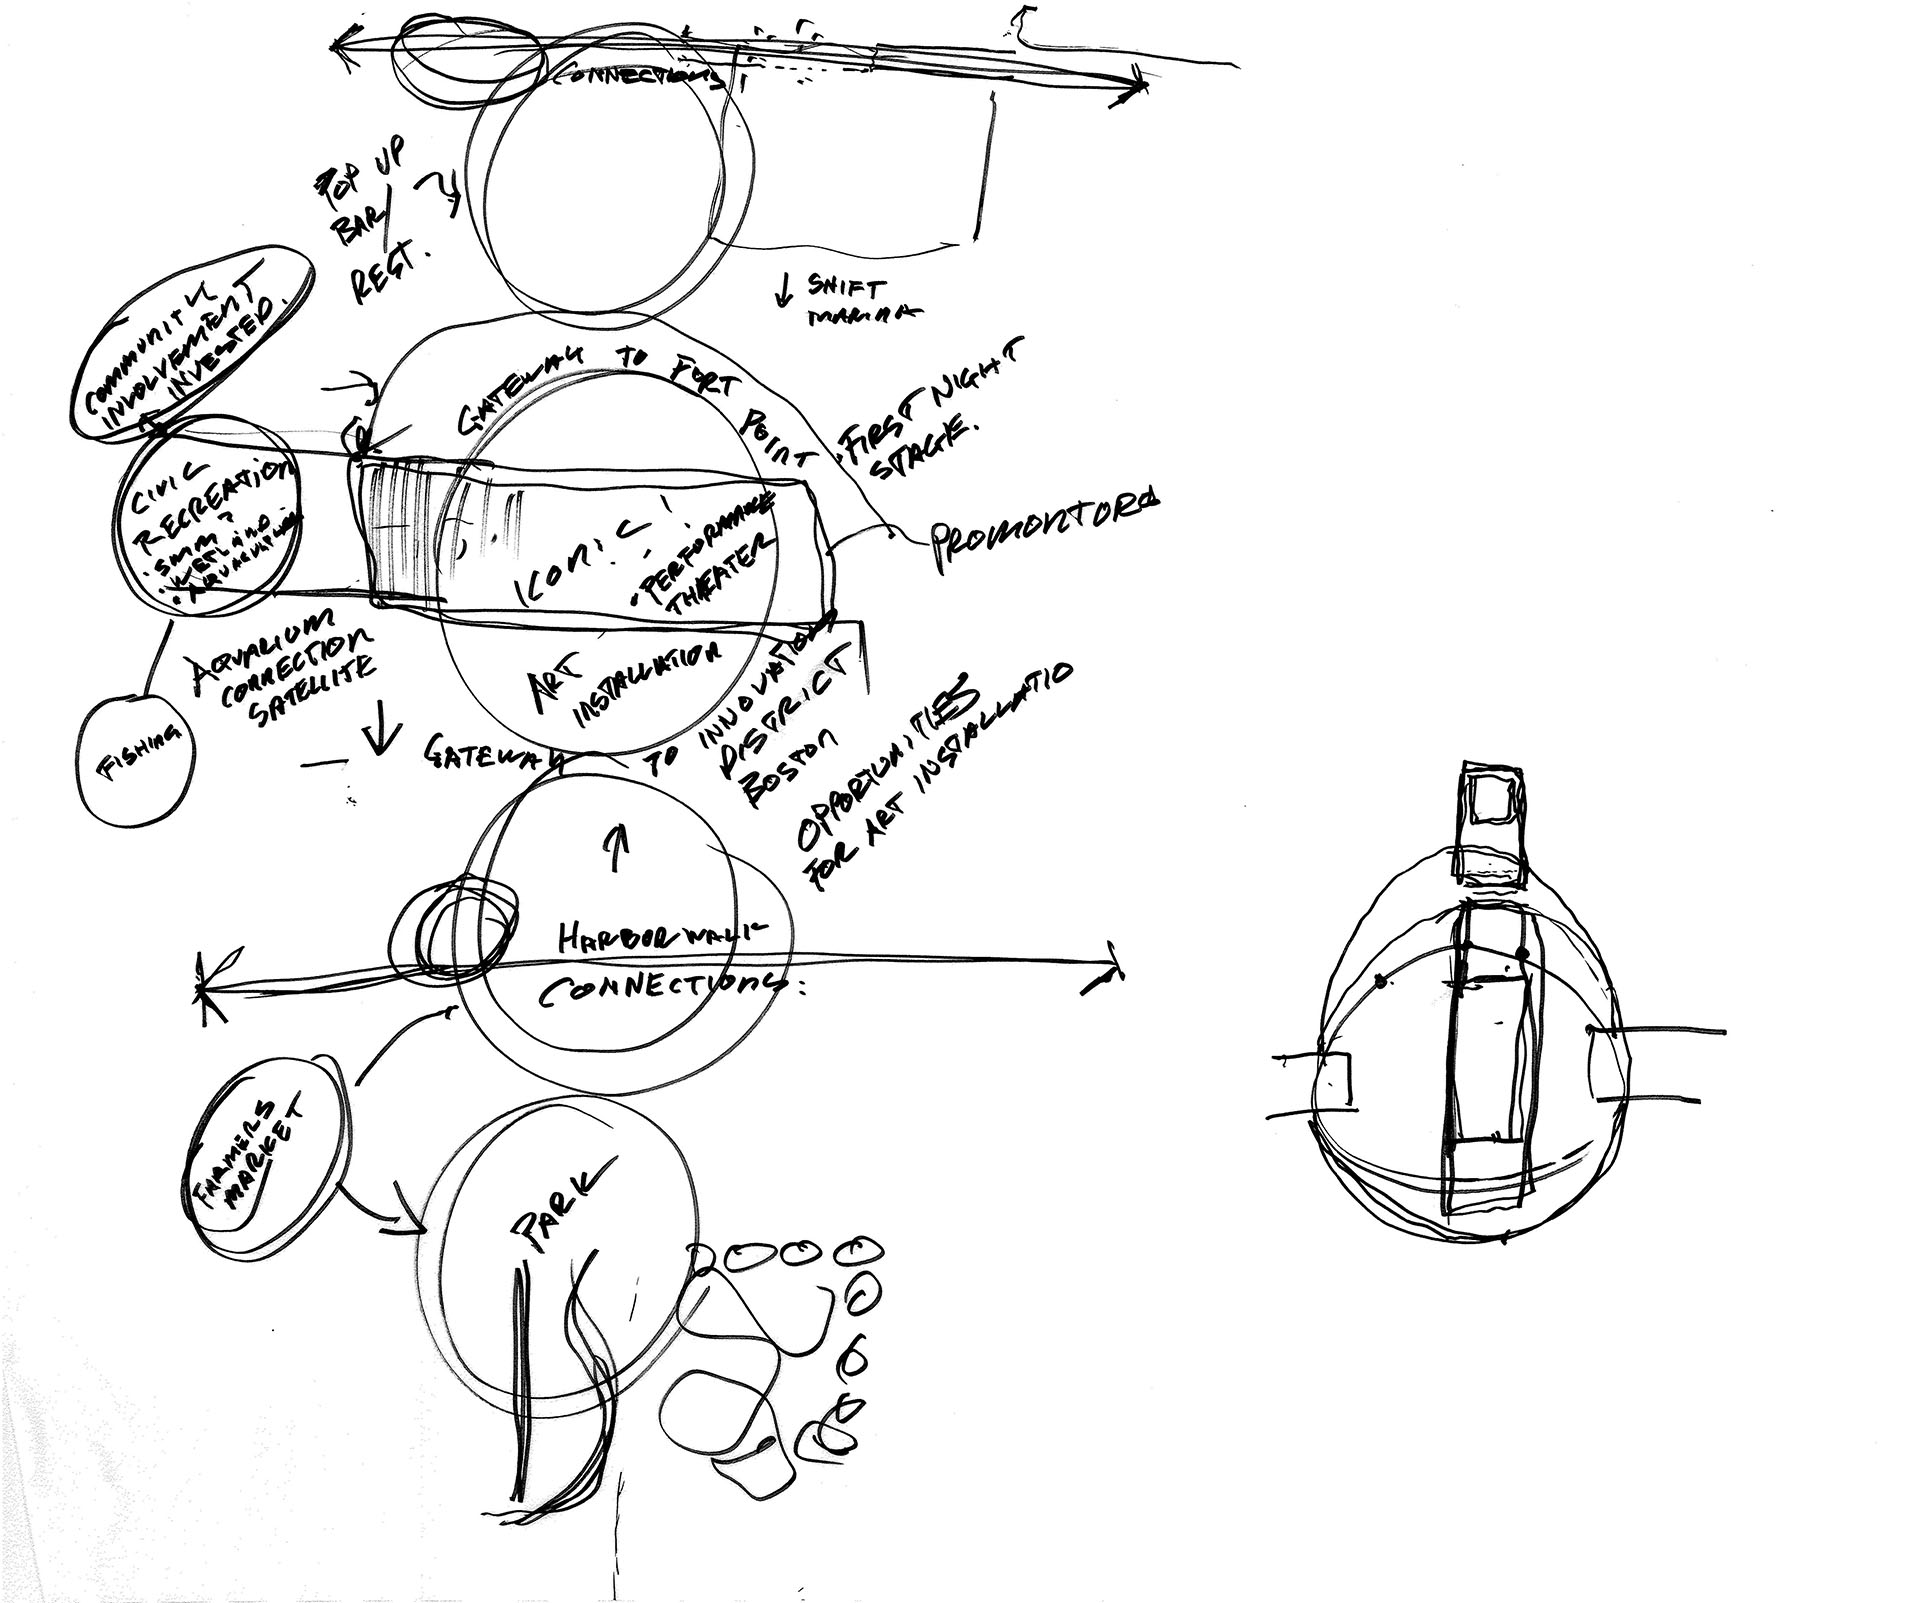 NABC_Sketch-2